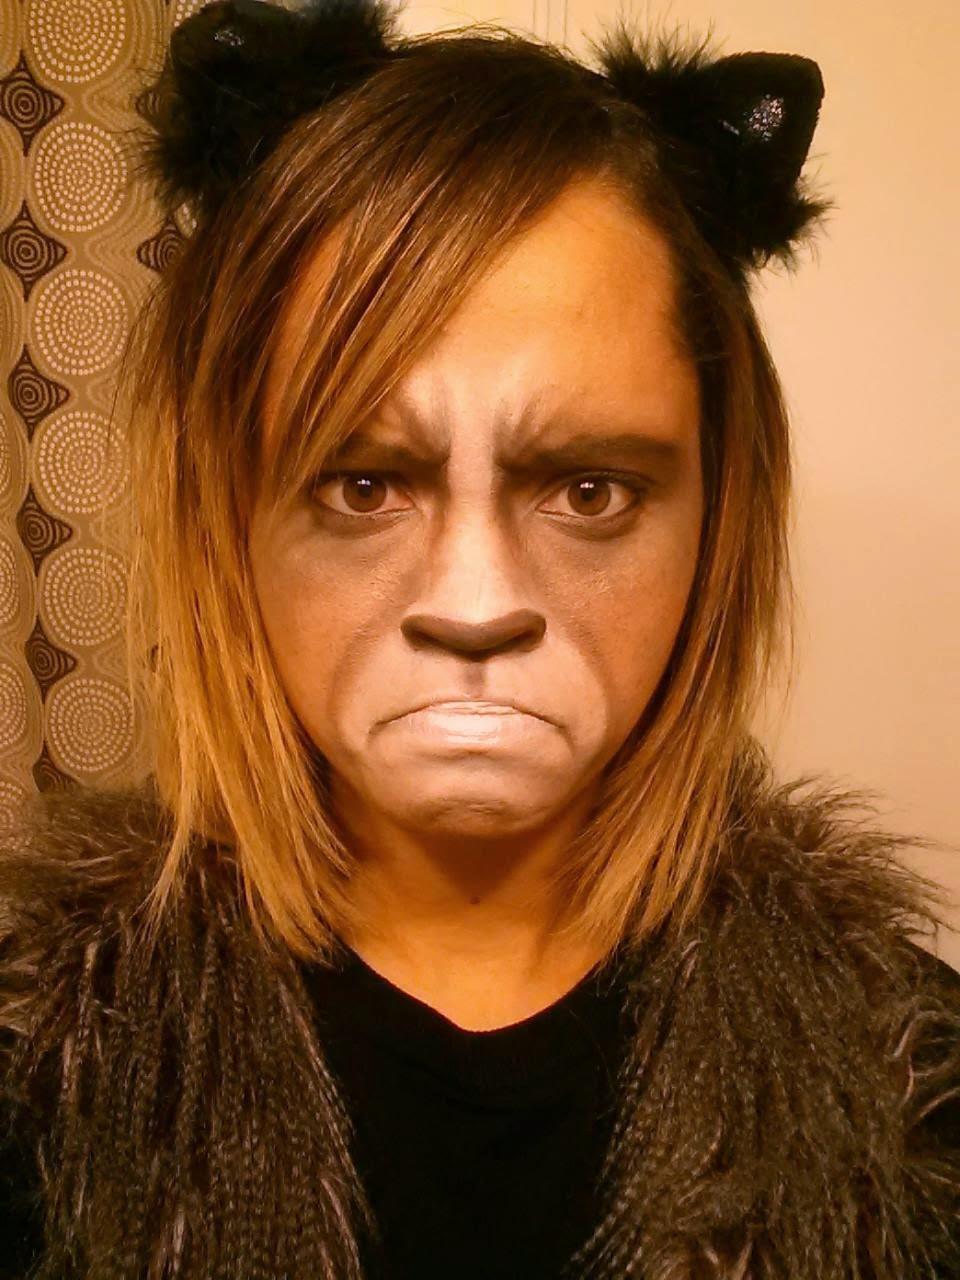 Grumpy Cate Halloween Make-up